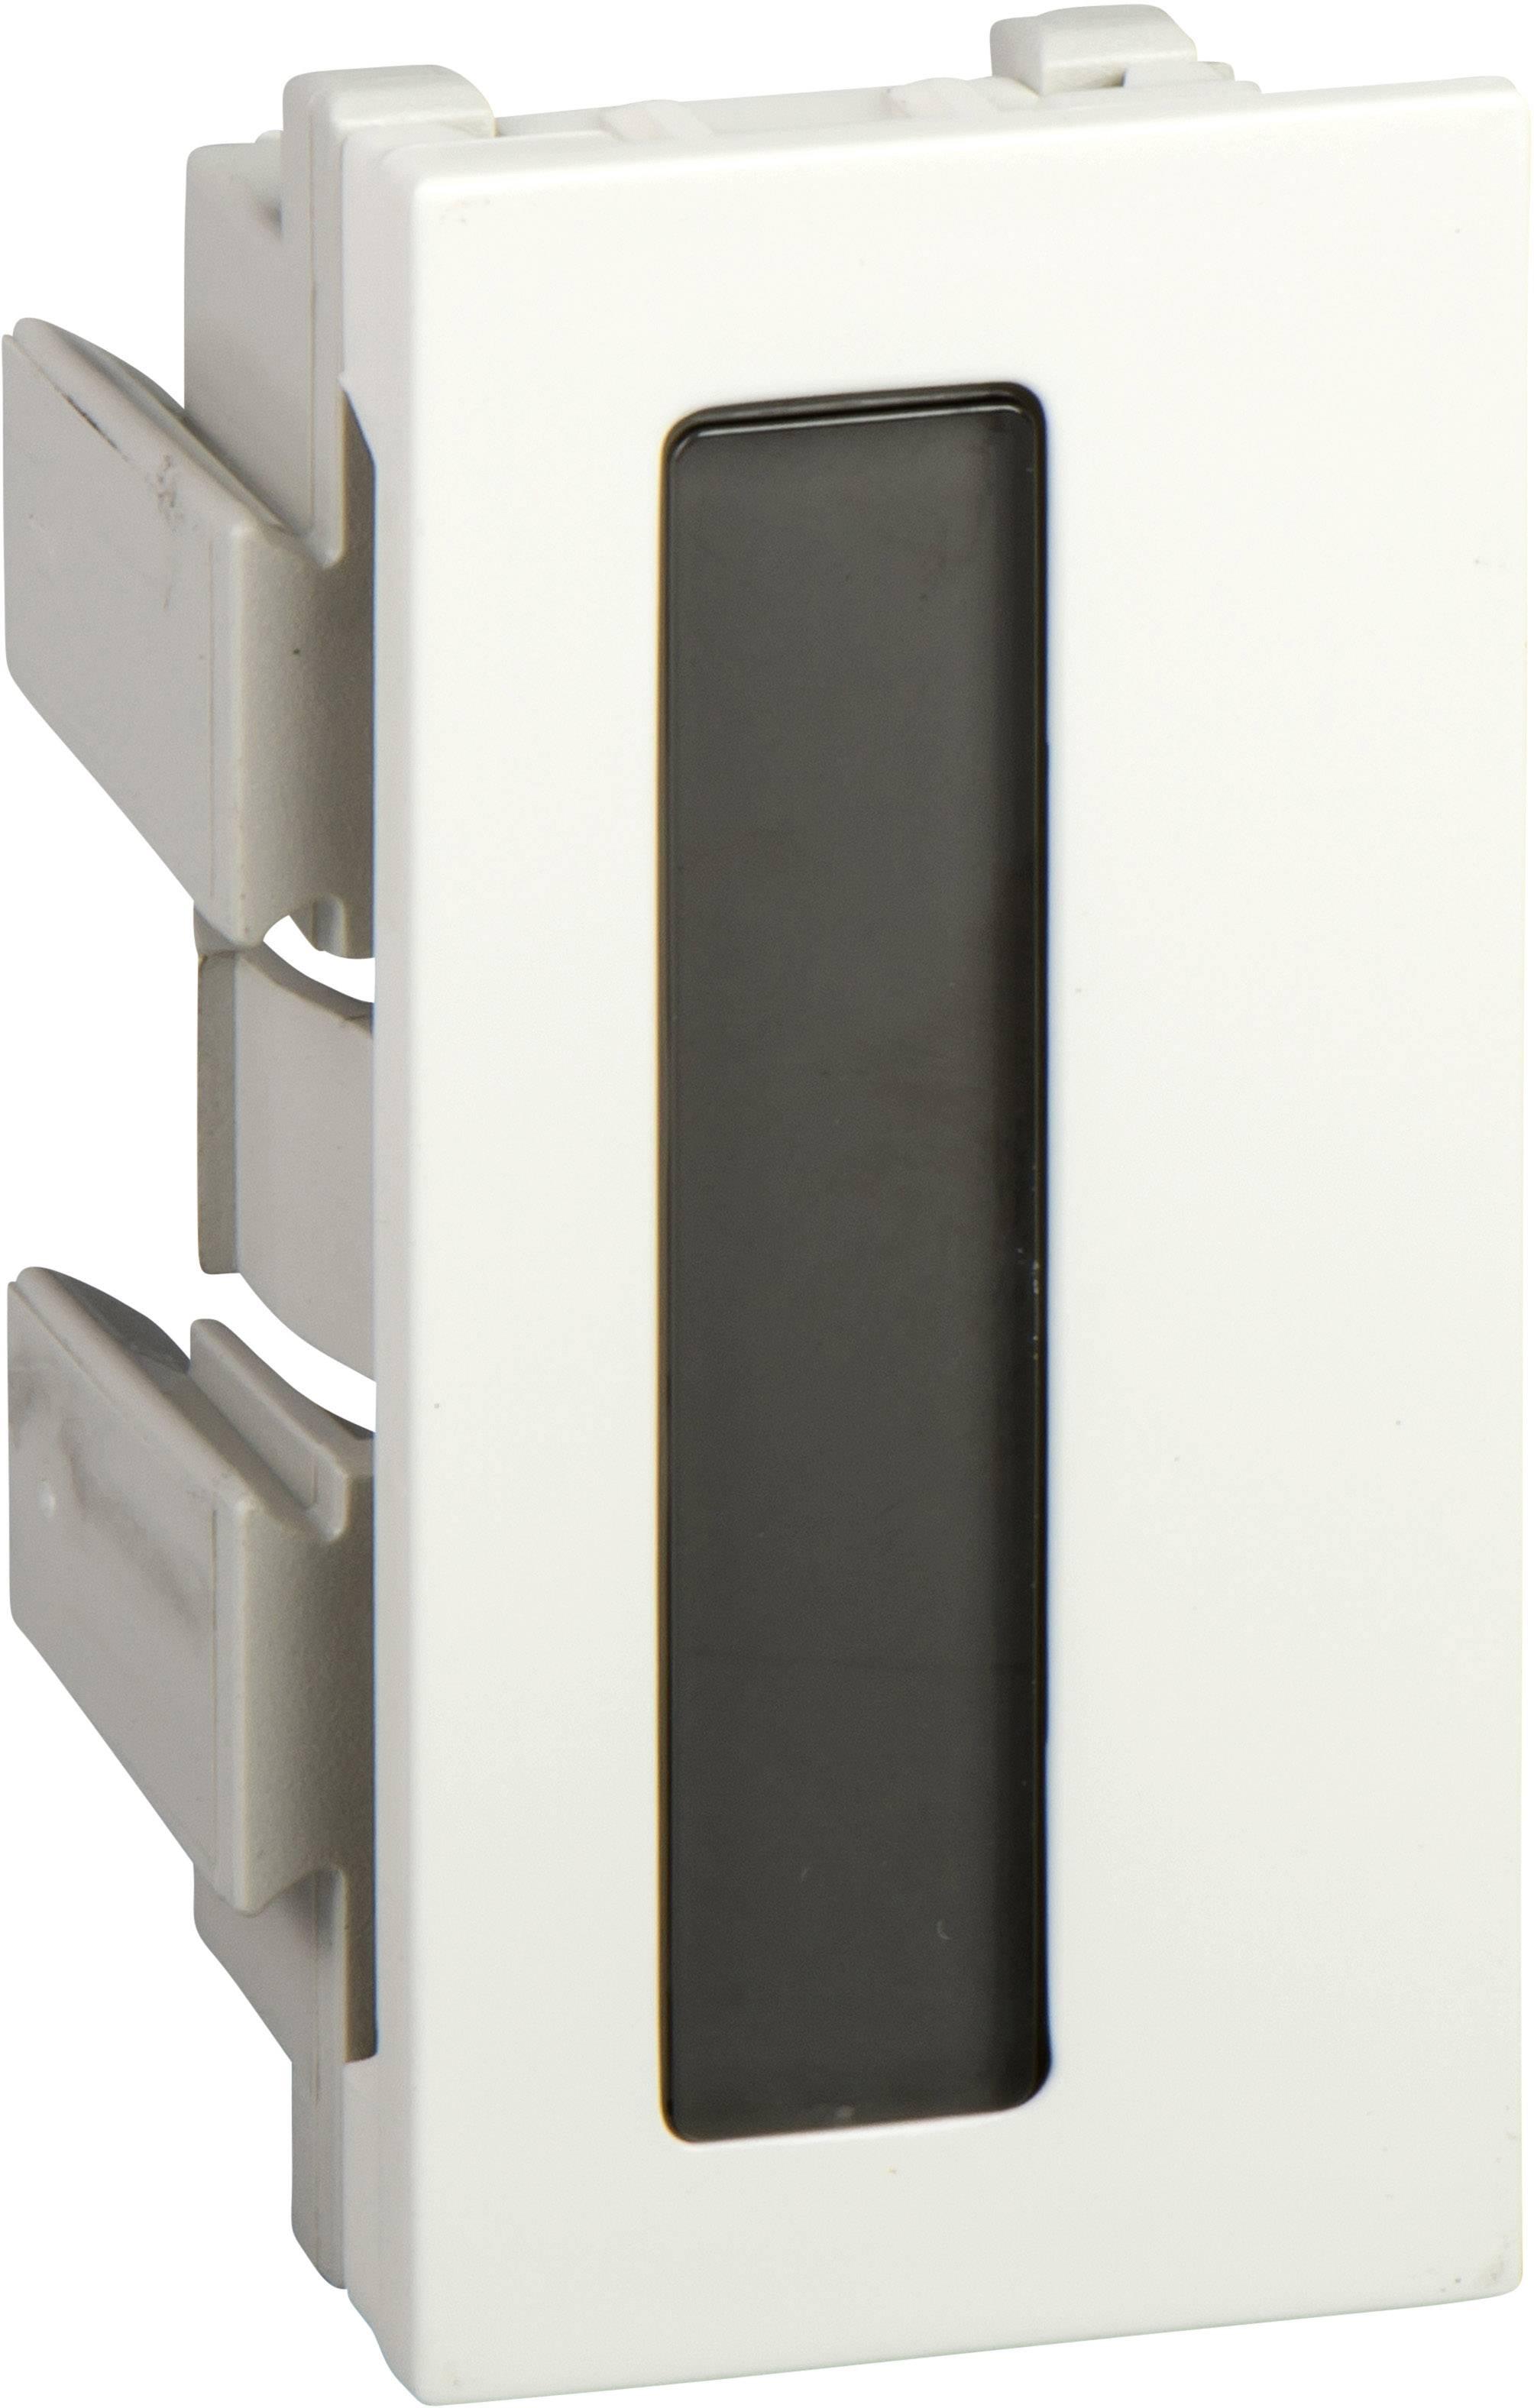 L x B 45 mm x 45 mm 1 St. KOPOS QS 45x45/_HB Geräteeinsatz 1fach Steckdose